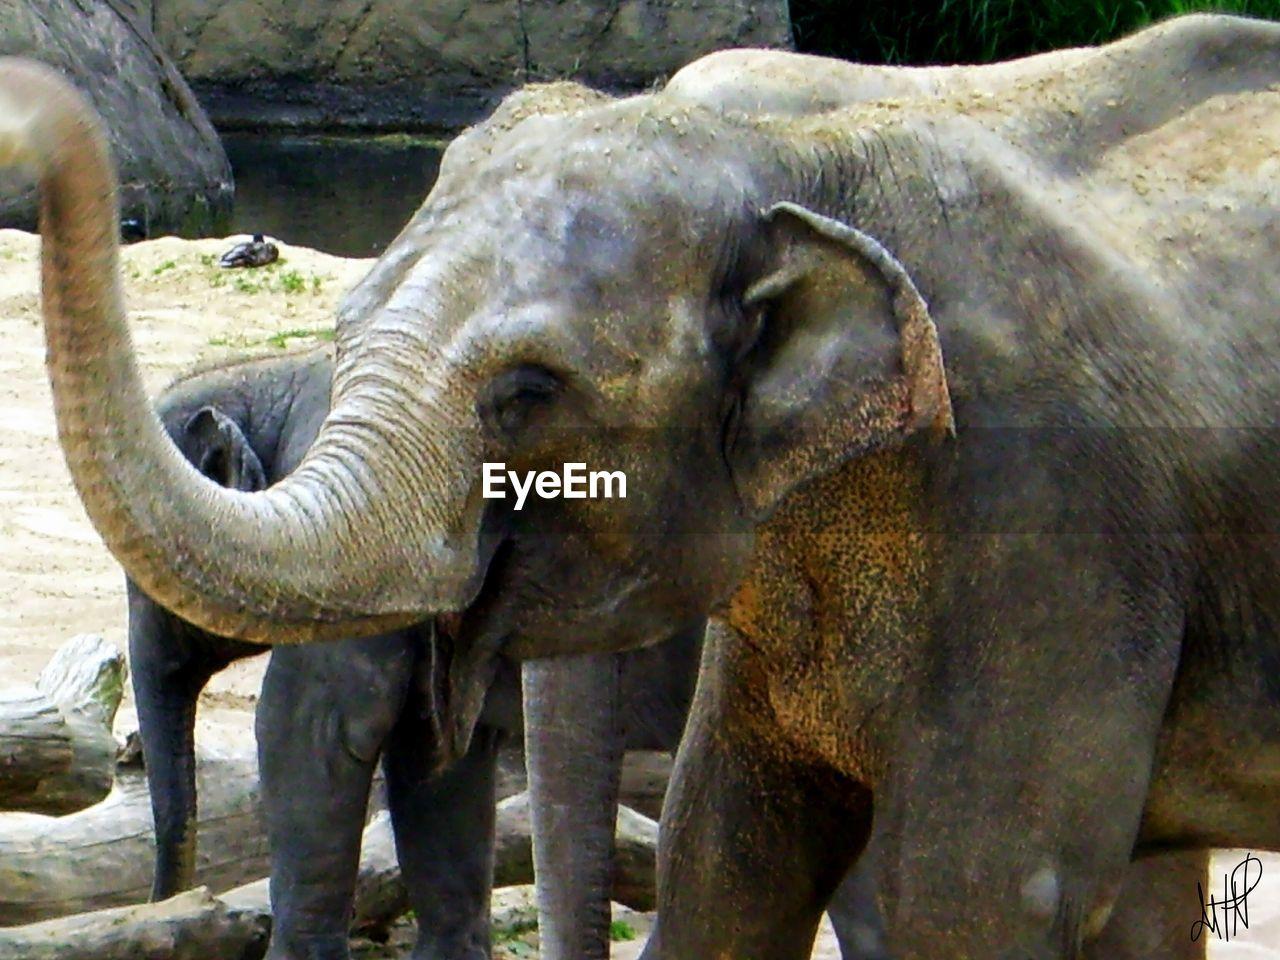 animal themes, animals in the wild, one animal, elephant, day, no people, animal wildlife, outdoors, mammal, standing, safari animals, animal trunk, close-up